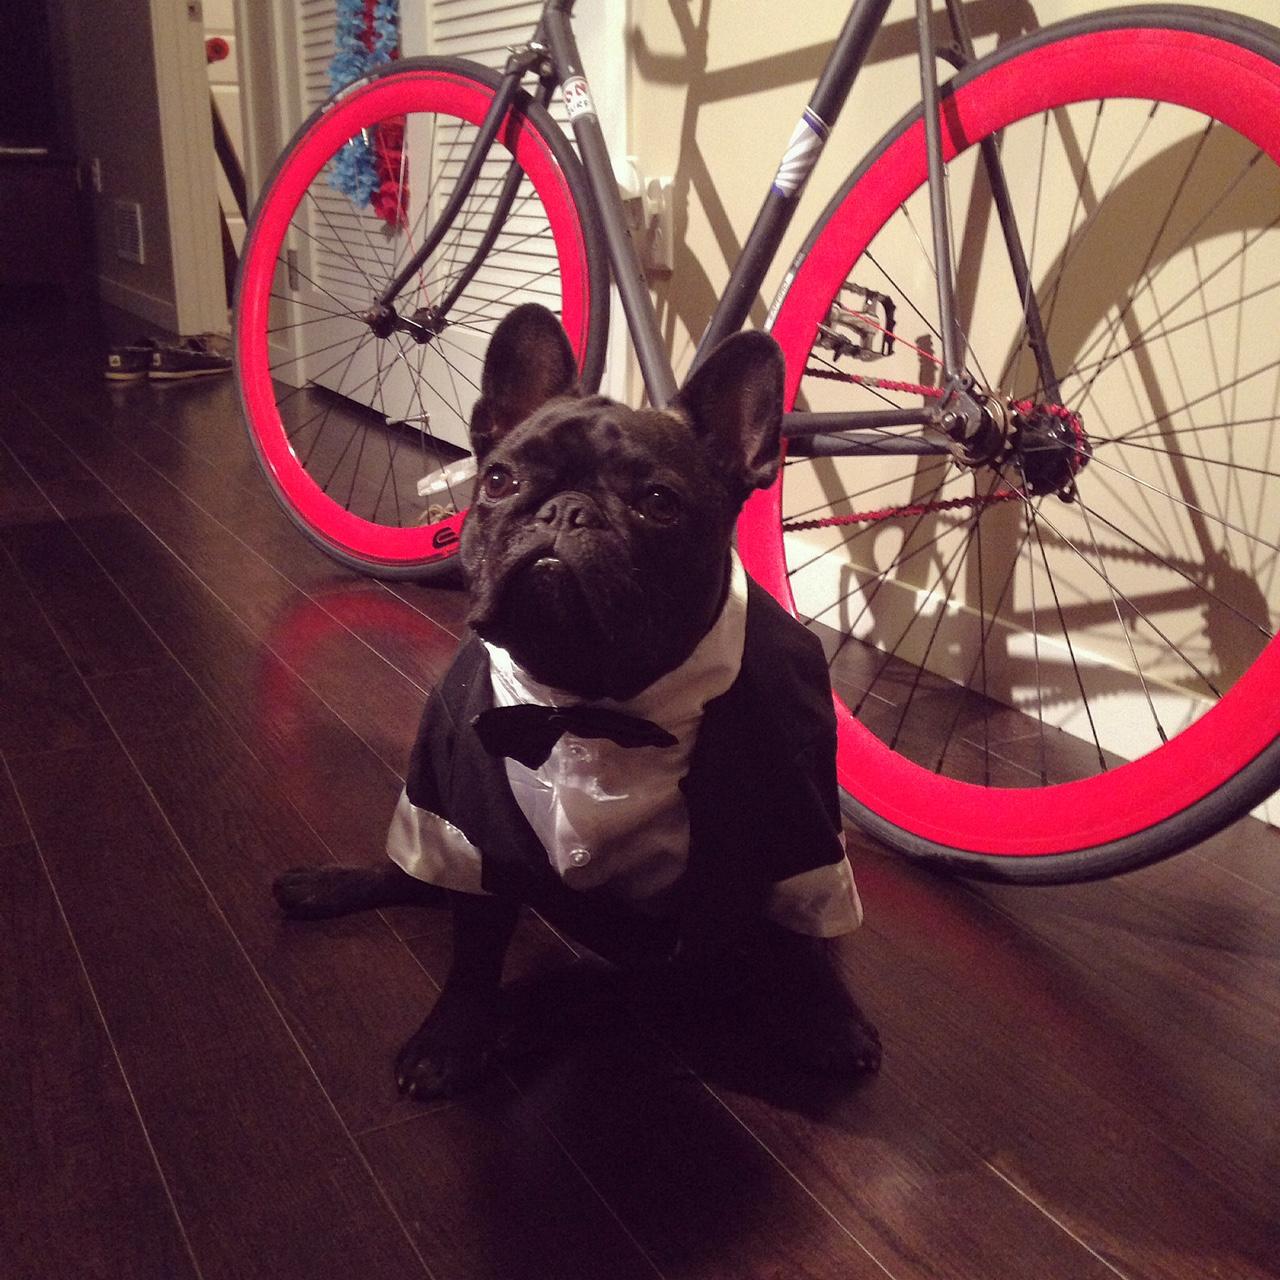 Gus-the-dog-300x168.jpg